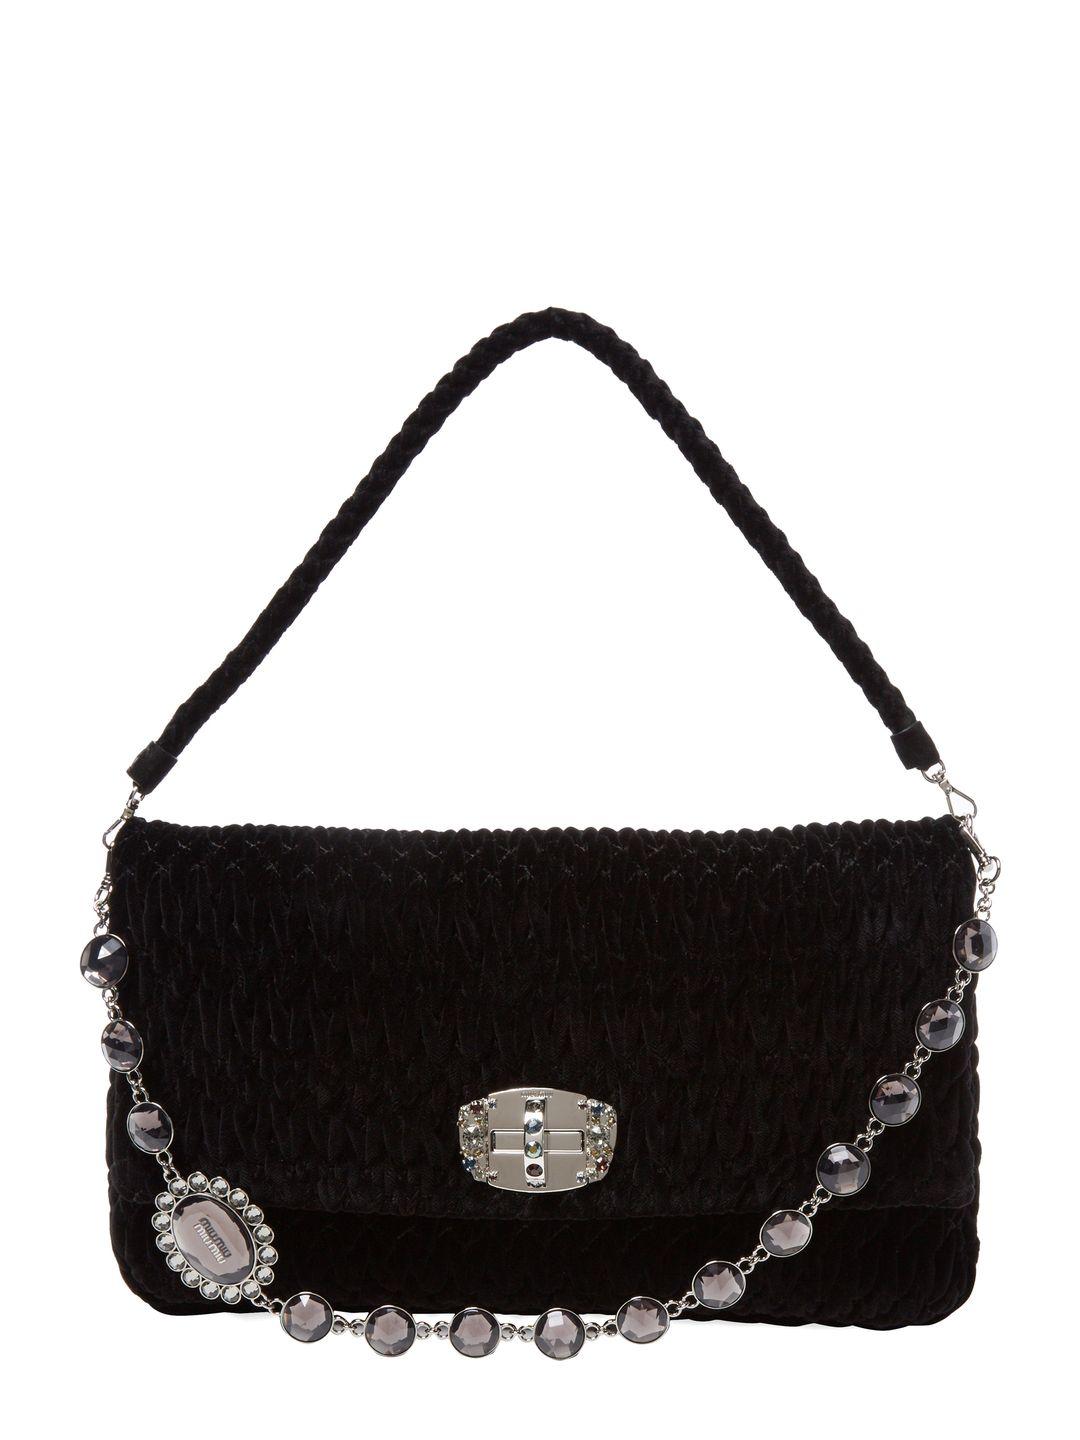 Miu Miu Embellished Chain Medium Suede Shoulder Bag at Gilt saved by #ShoppingIS